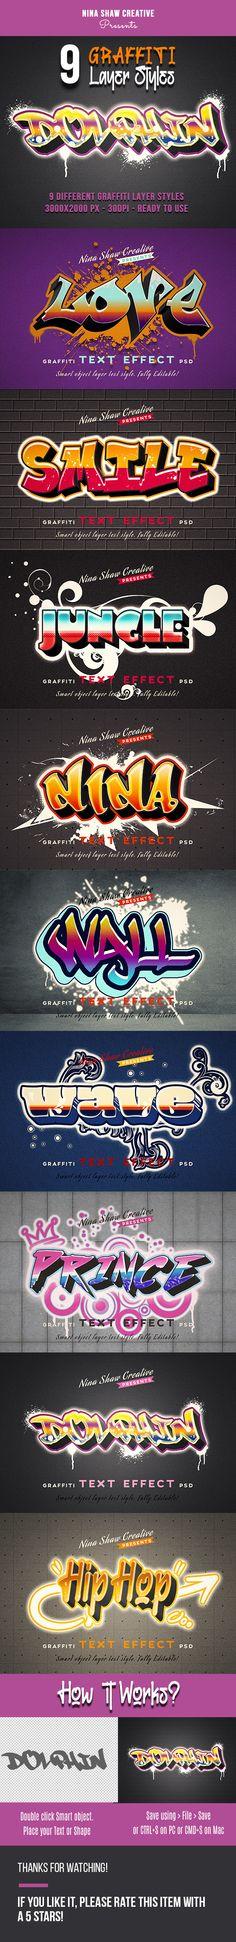 Graffiti Effect Graffiti Text, Graffiti Artwork, Graffiti Wall, Photoshop Text Effects, Photoshop Actions, Asl Words, Avengers Texts, Simple Powerpoint Templates, Flyer Layout